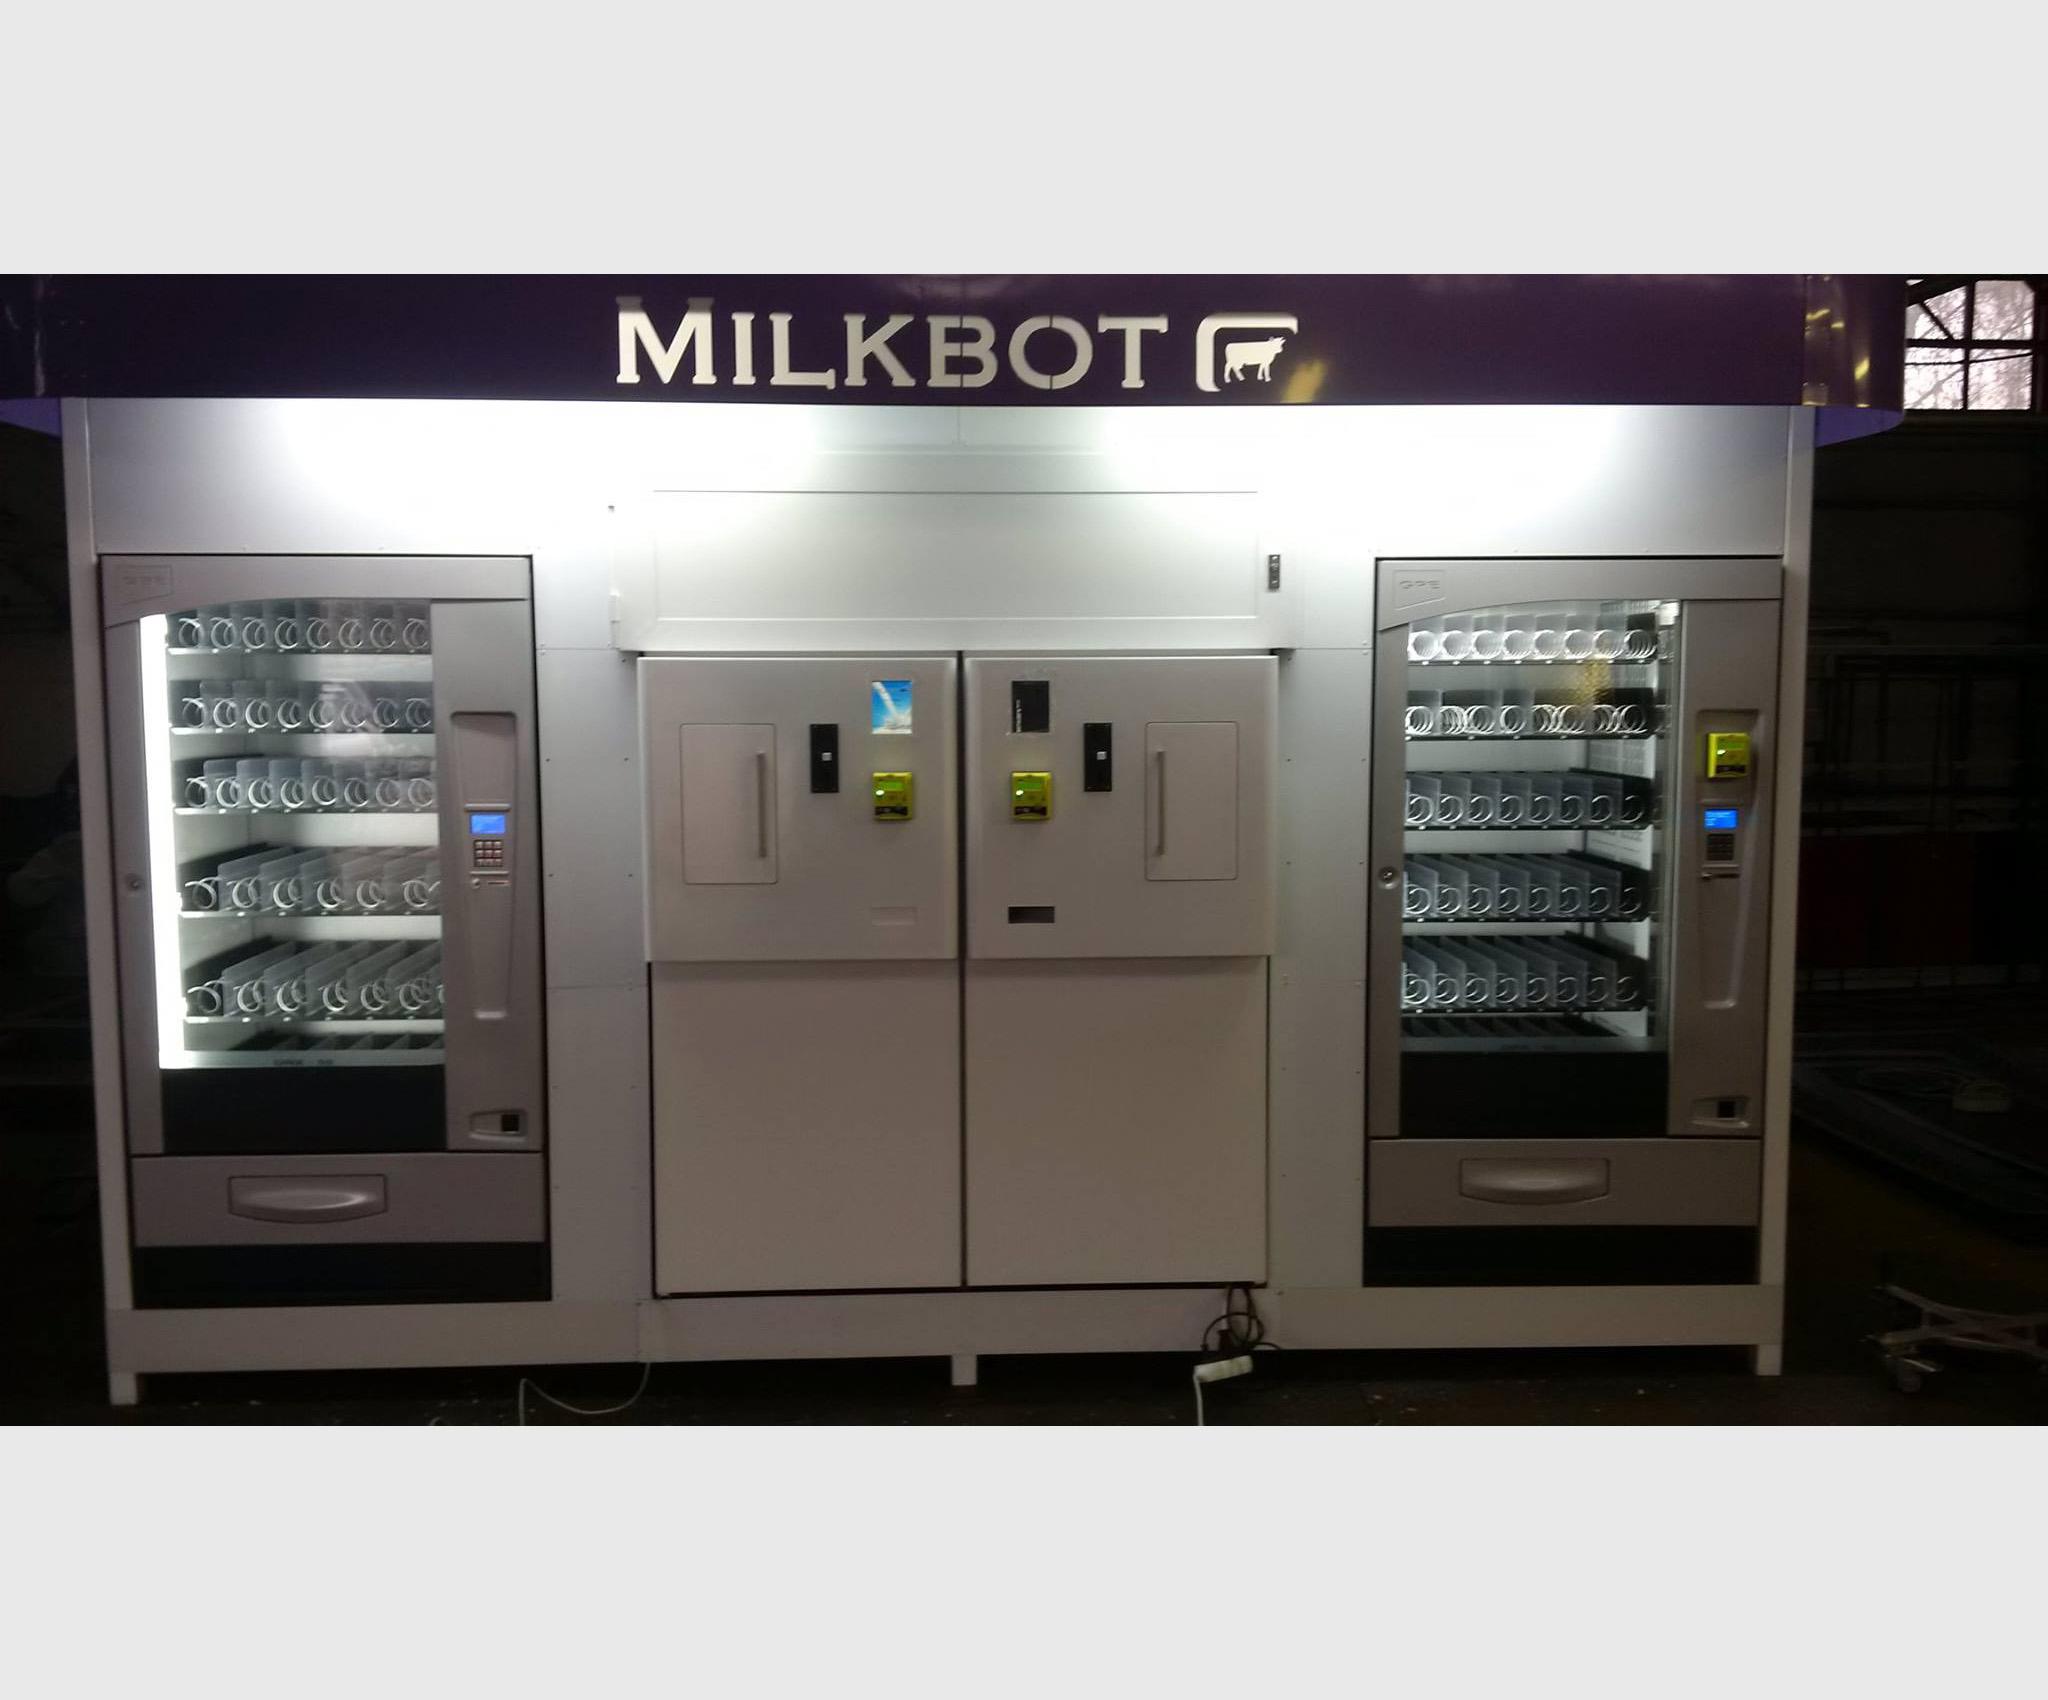 Milk vending machine Megamilkbot